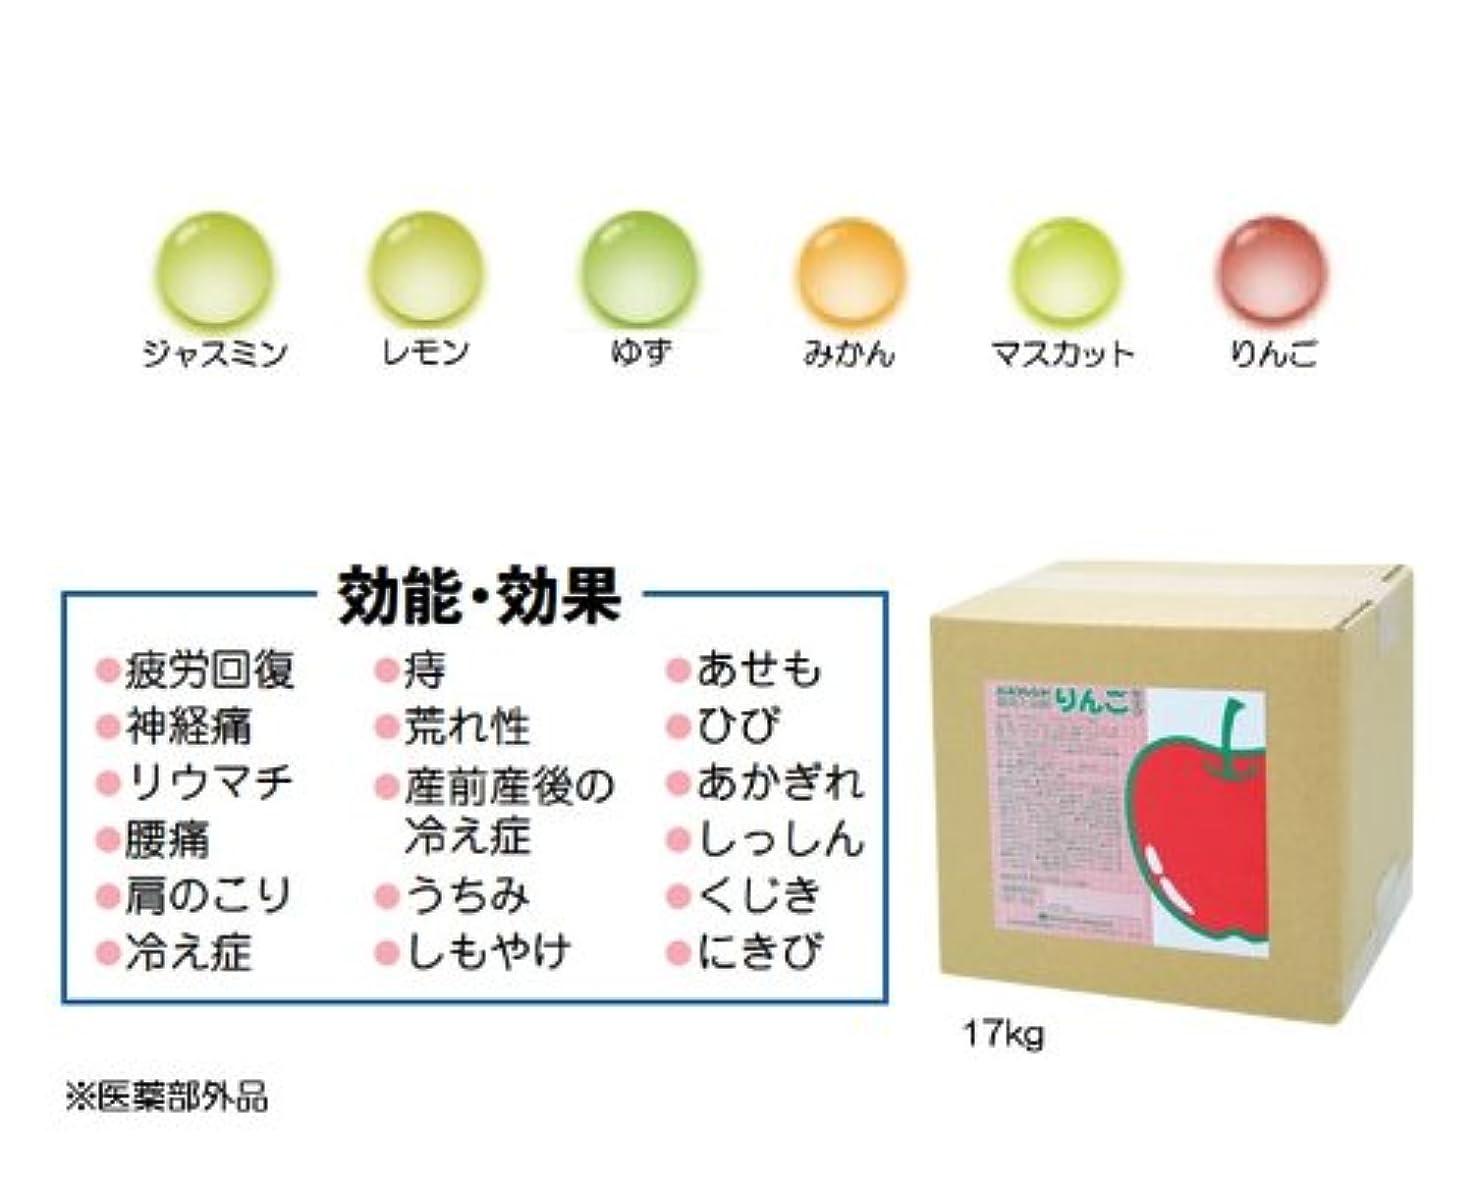 安息年金電球薬用入浴剤 ゆず 17kg 医薬部外品 業務用